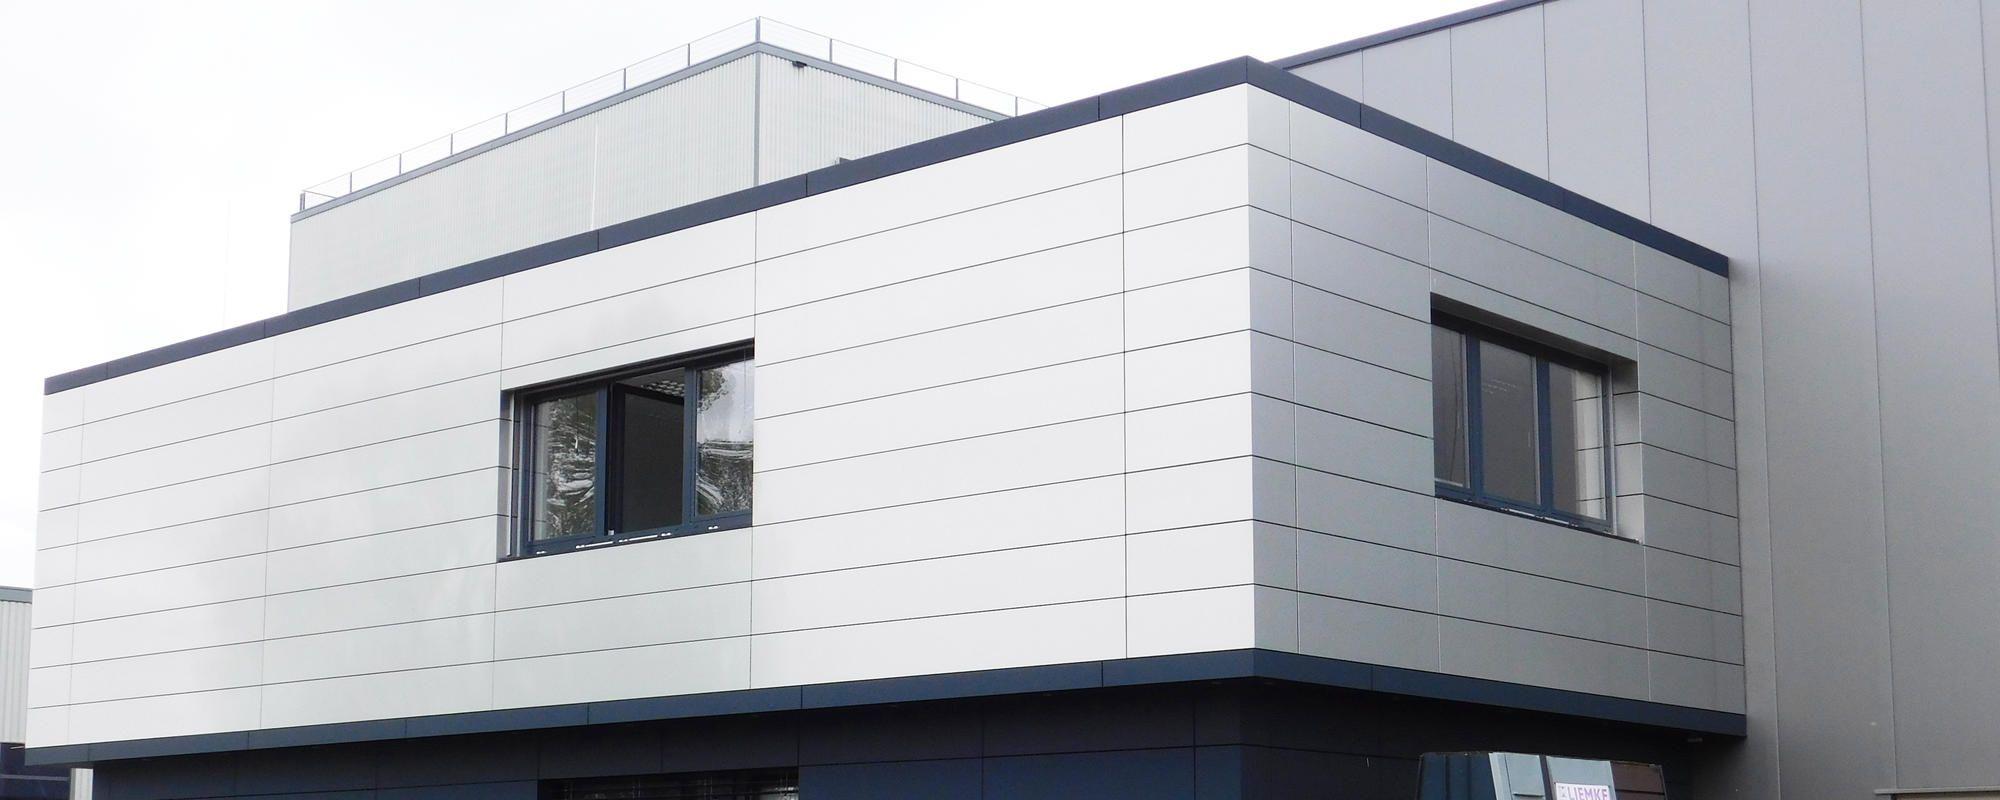 Fassade Verbundplatte Aluminium Haushaut Haus Aluminium